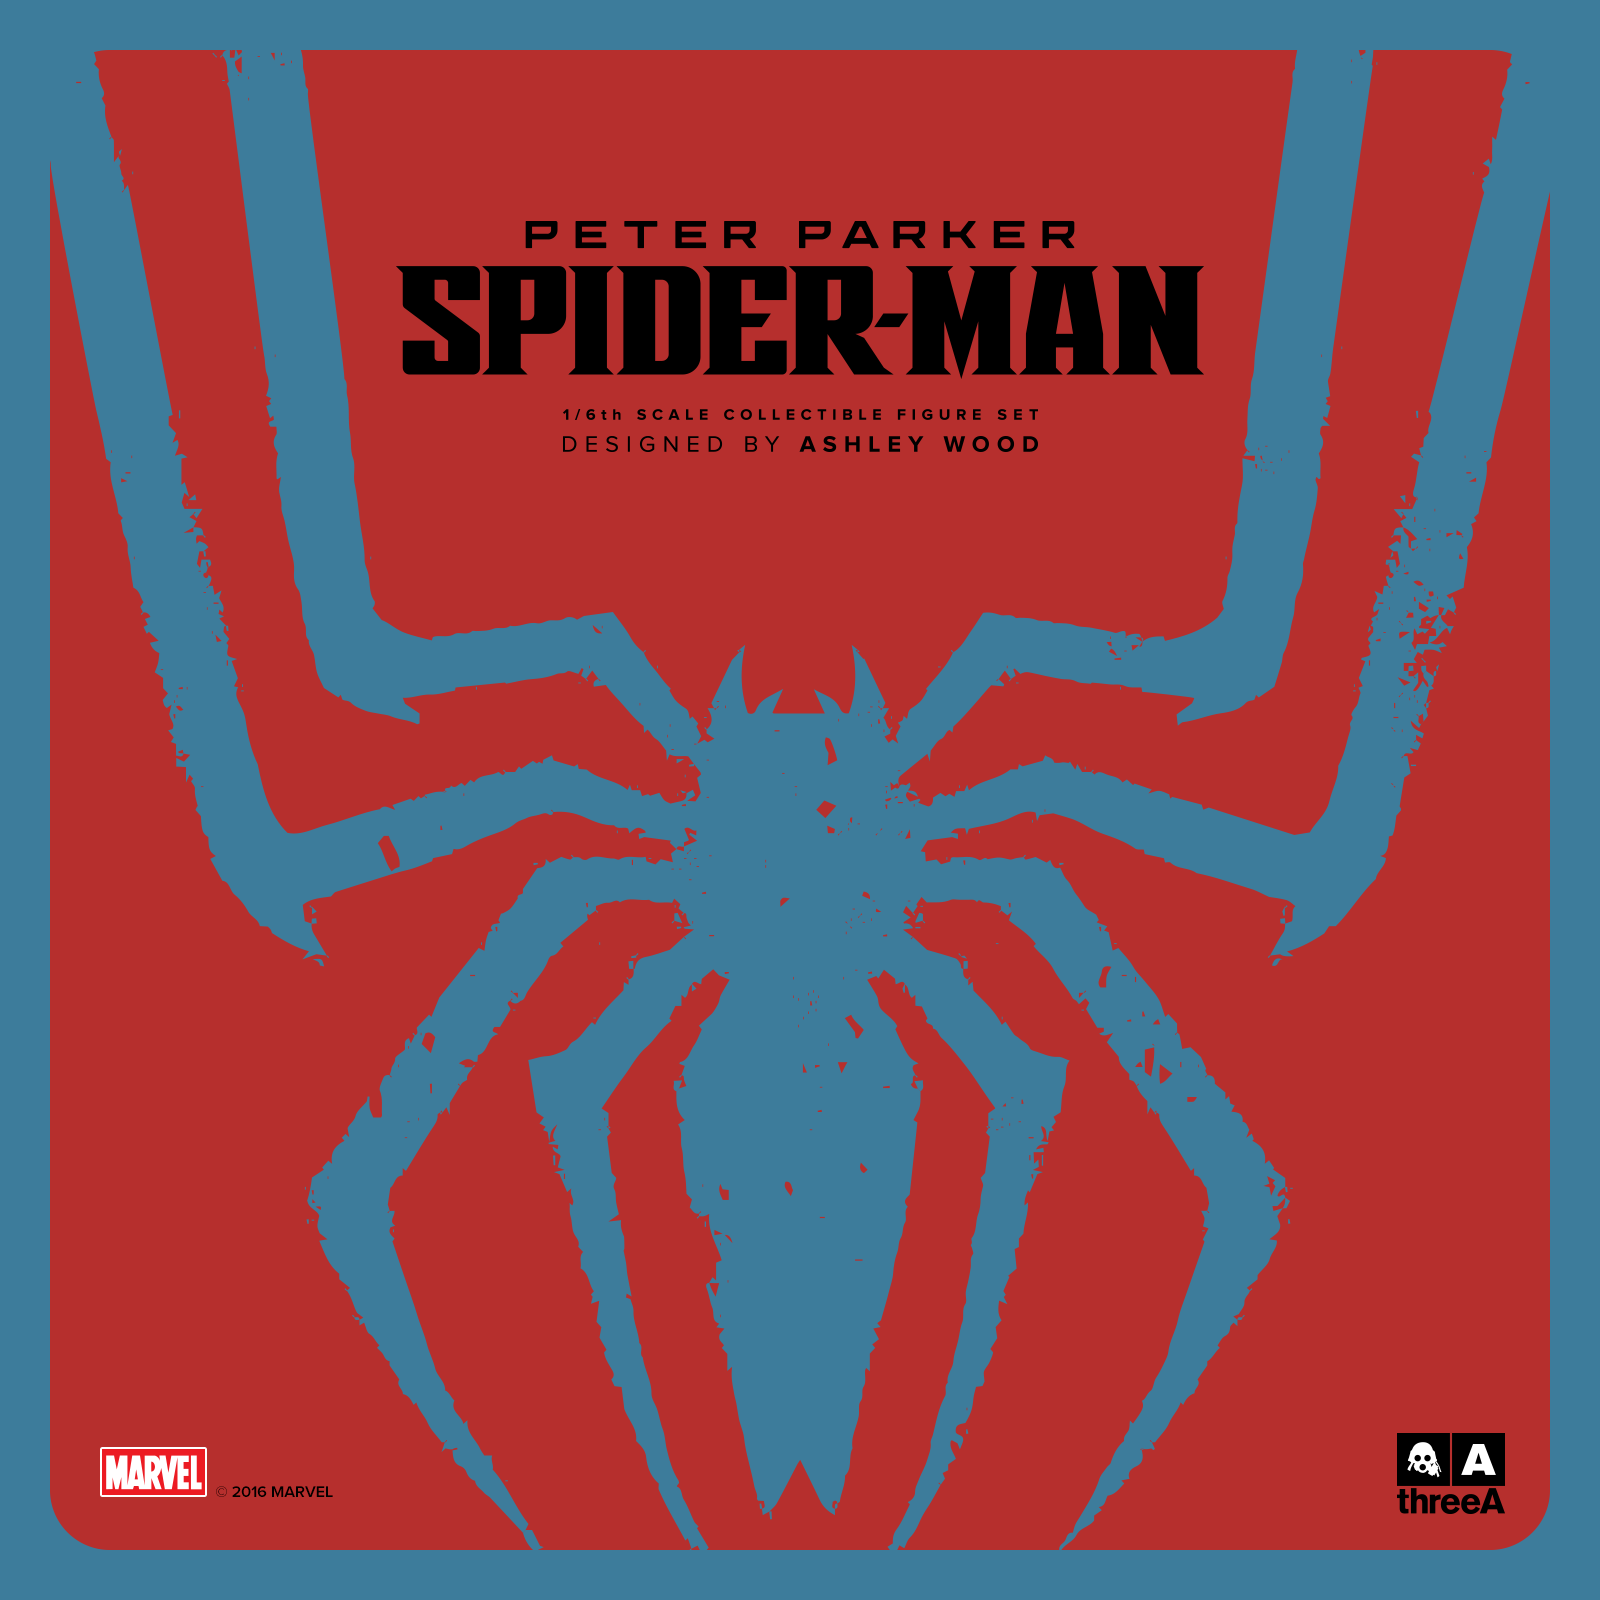 3A_Marvel_PeterParker_Spider-Man_TeaserAd_Red+Blue.png